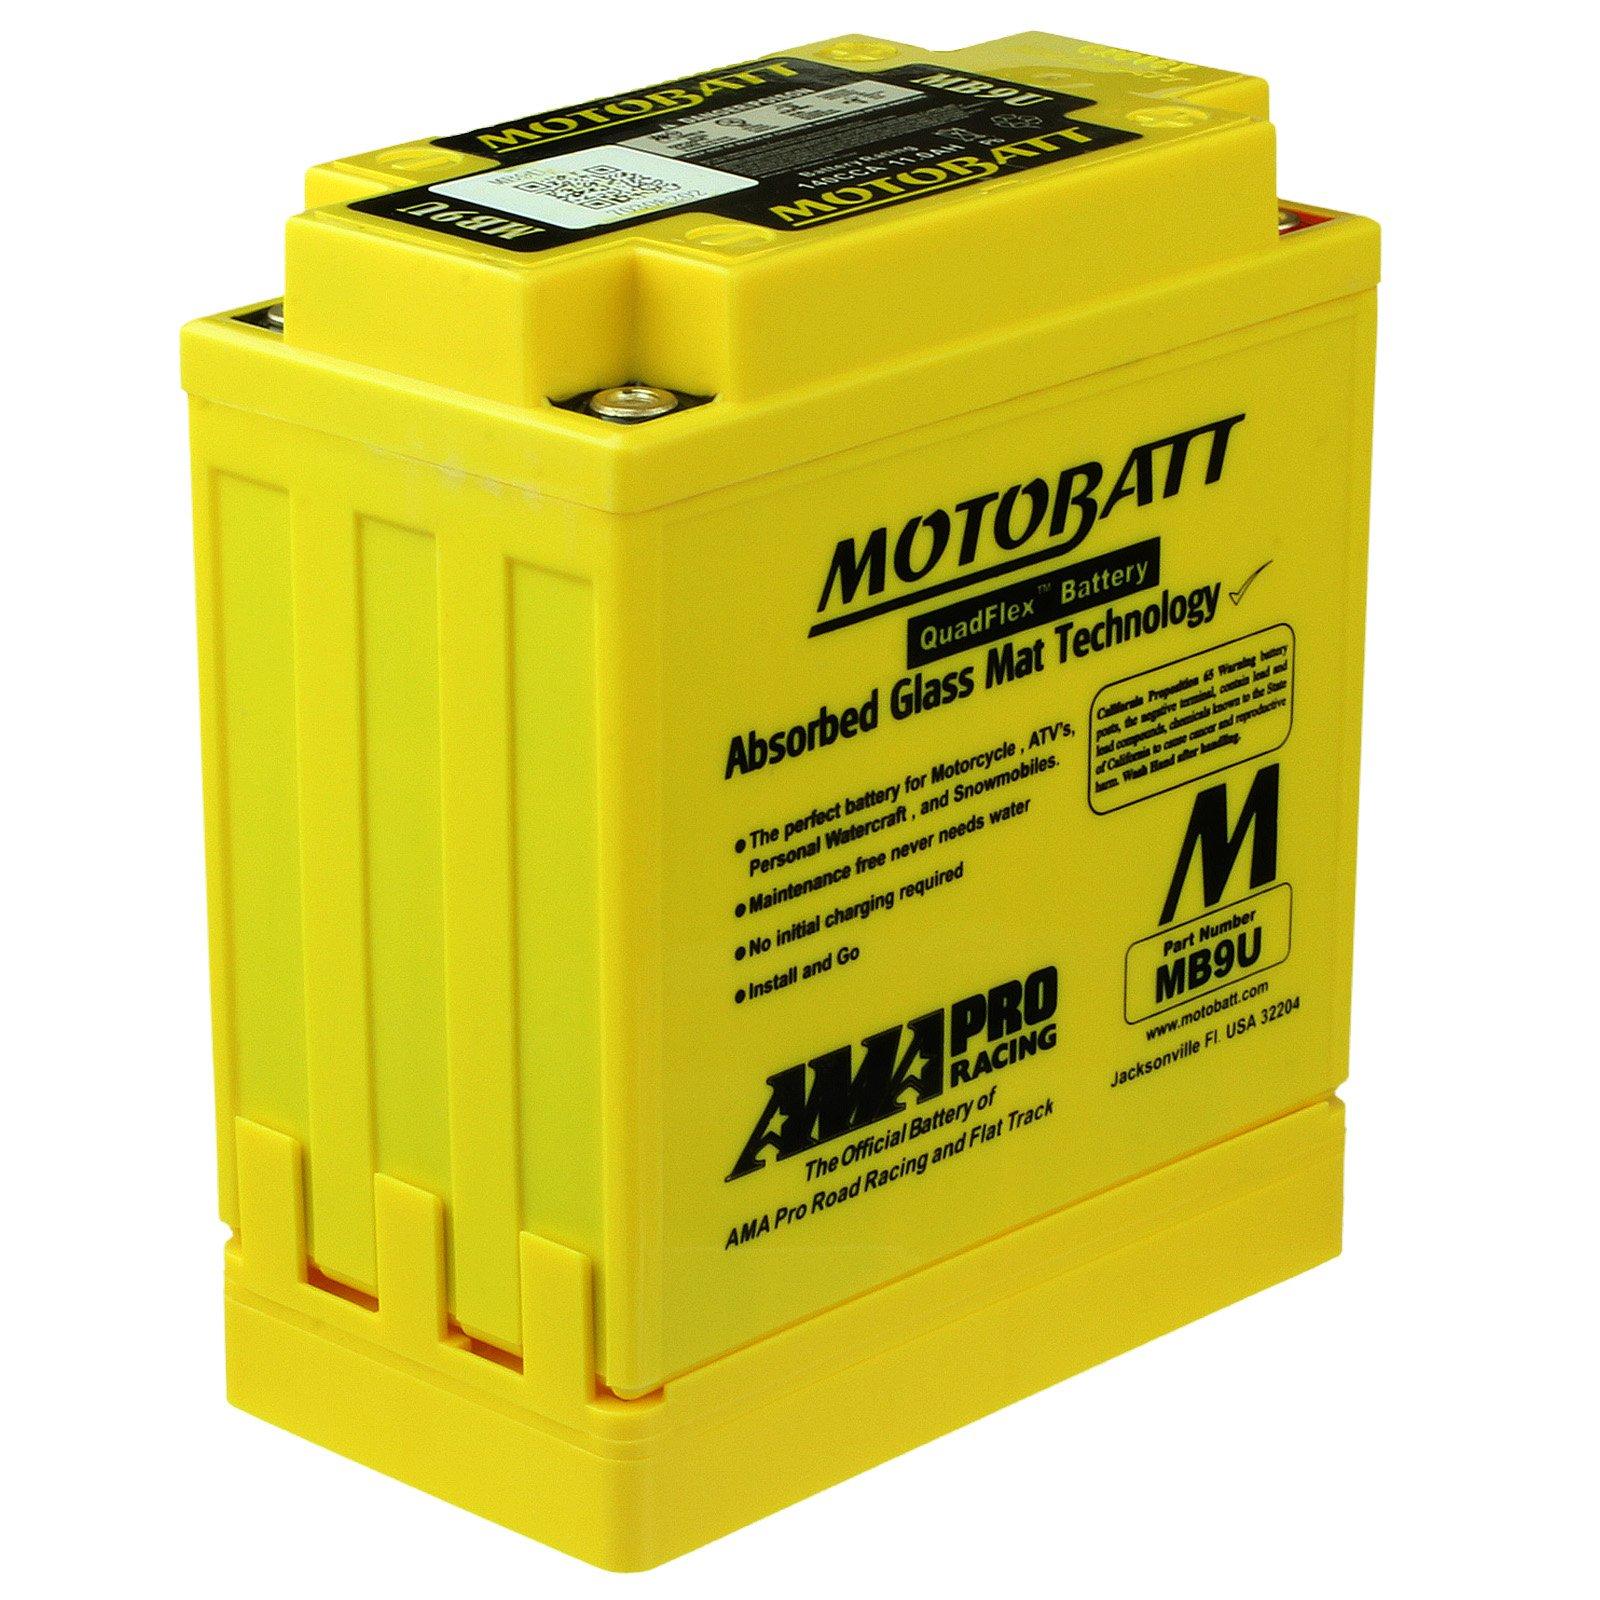 Motobatt Mb9u 12v 11ah Agm Battery Free Shipping